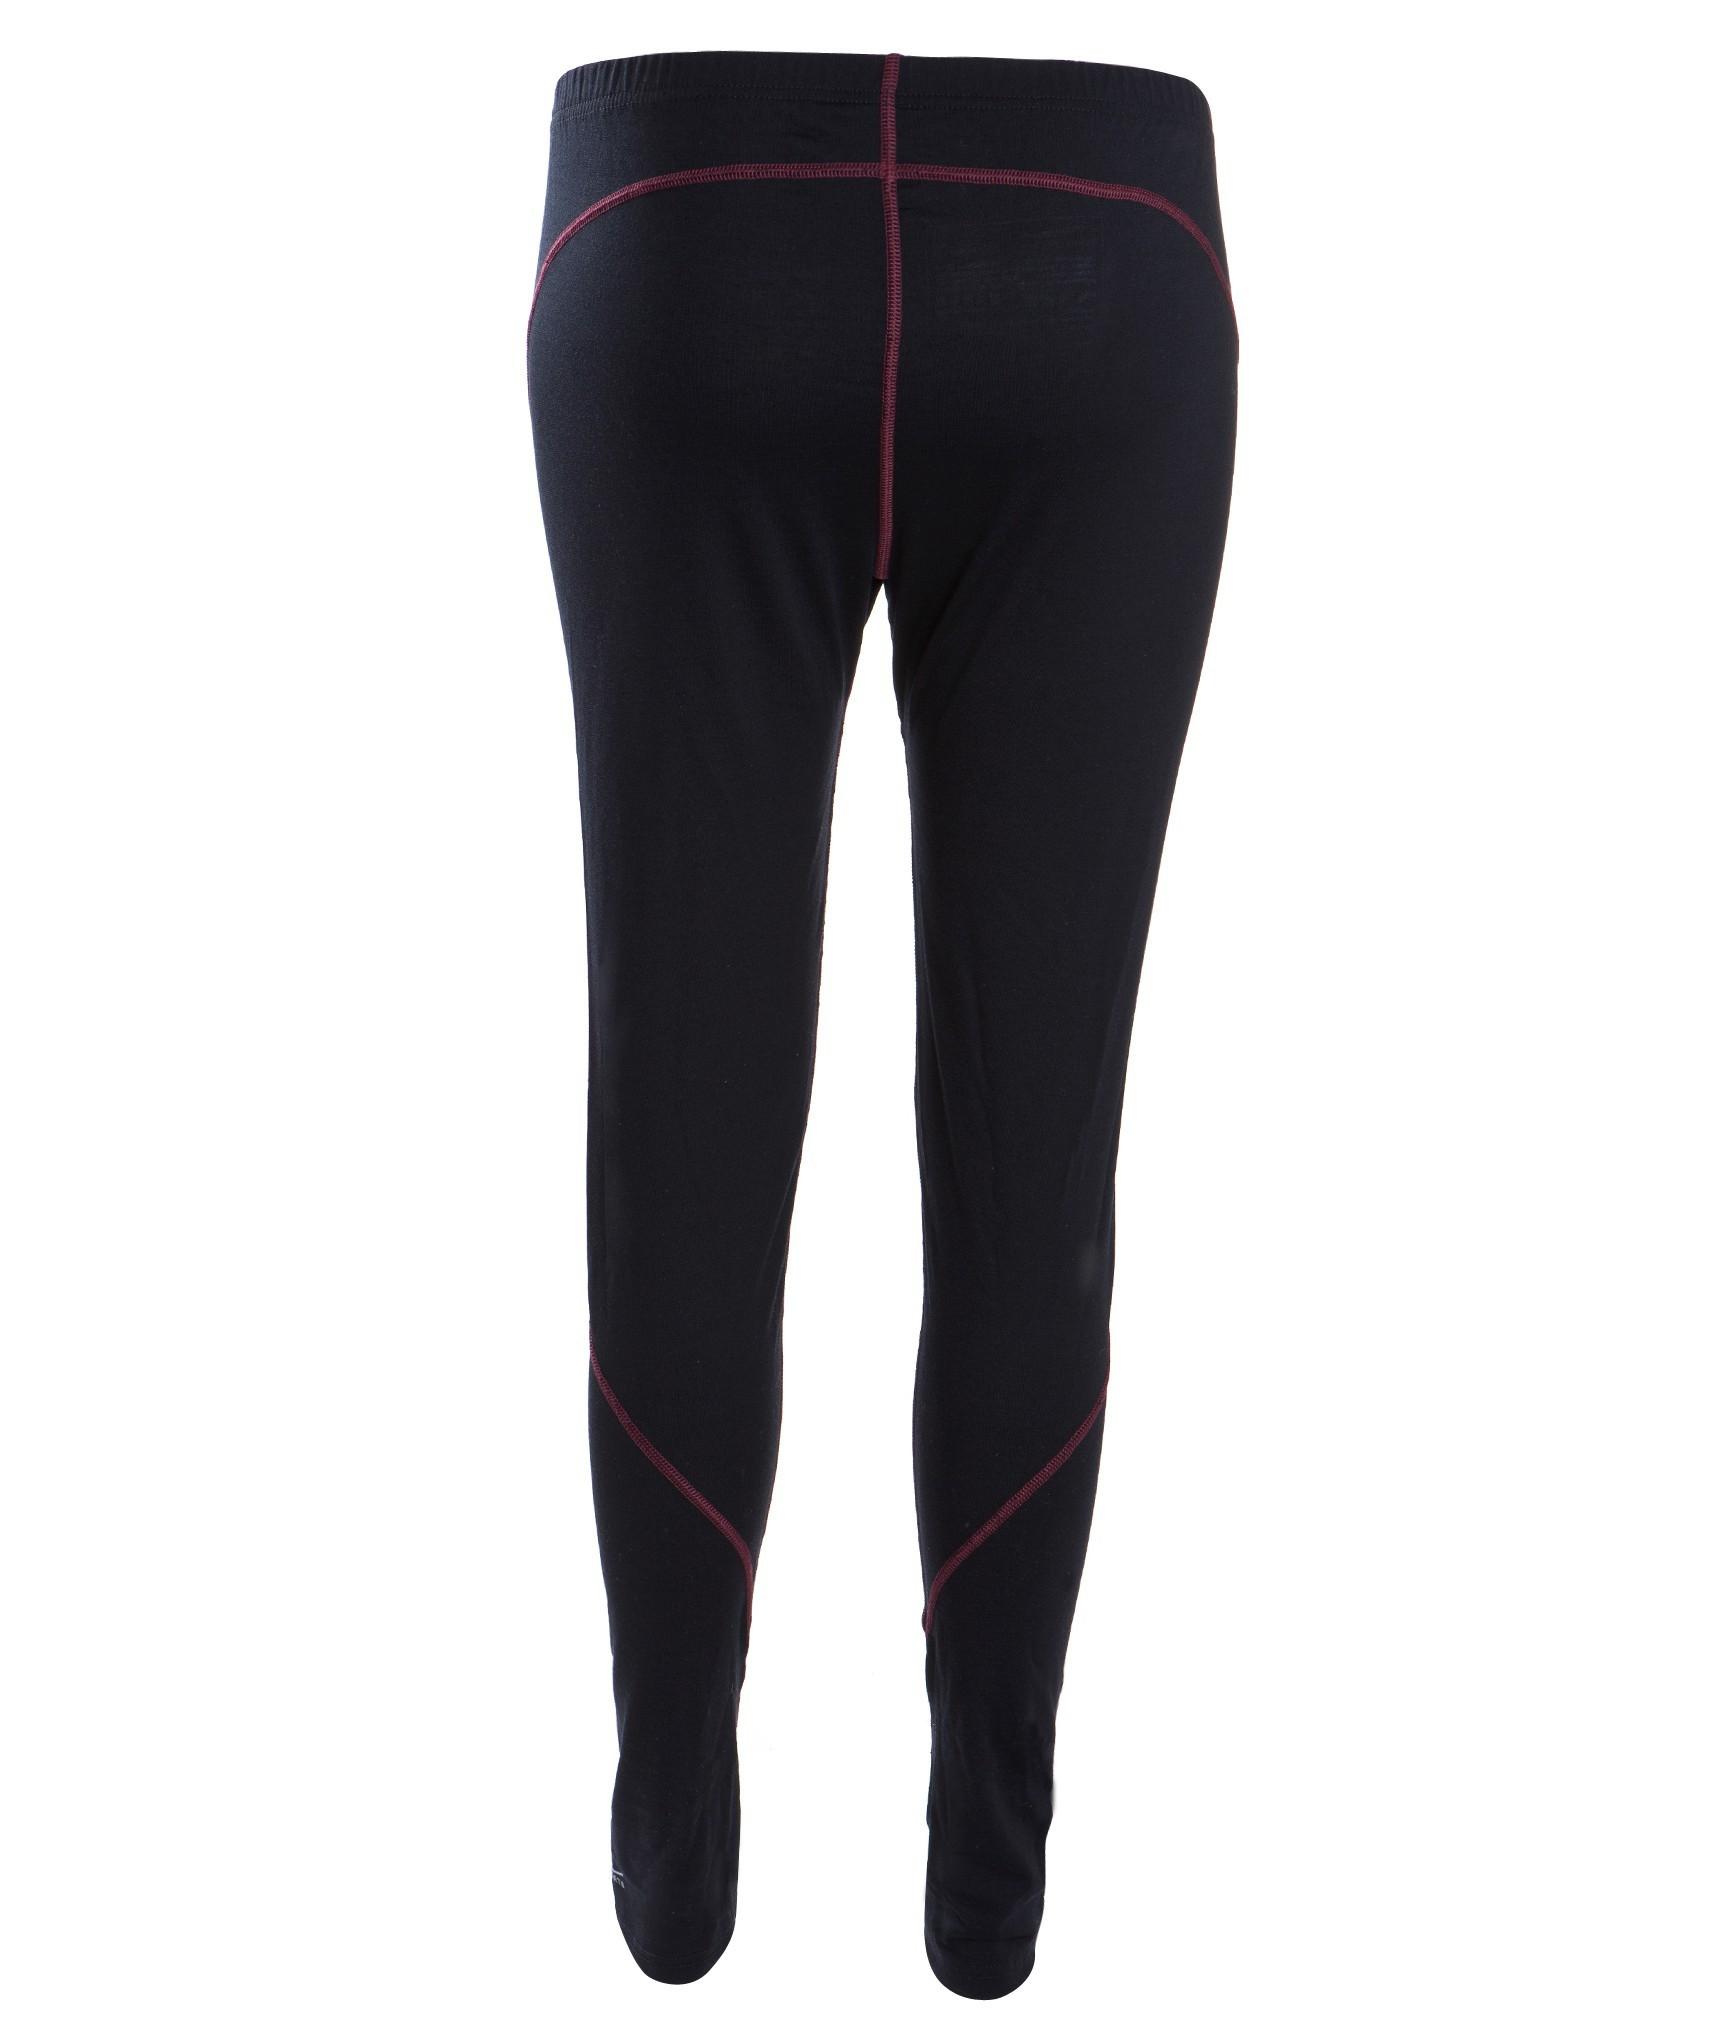 engel sports leggings lang women sport bio sportkleidung. Black Bedroom Furniture Sets. Home Design Ideas